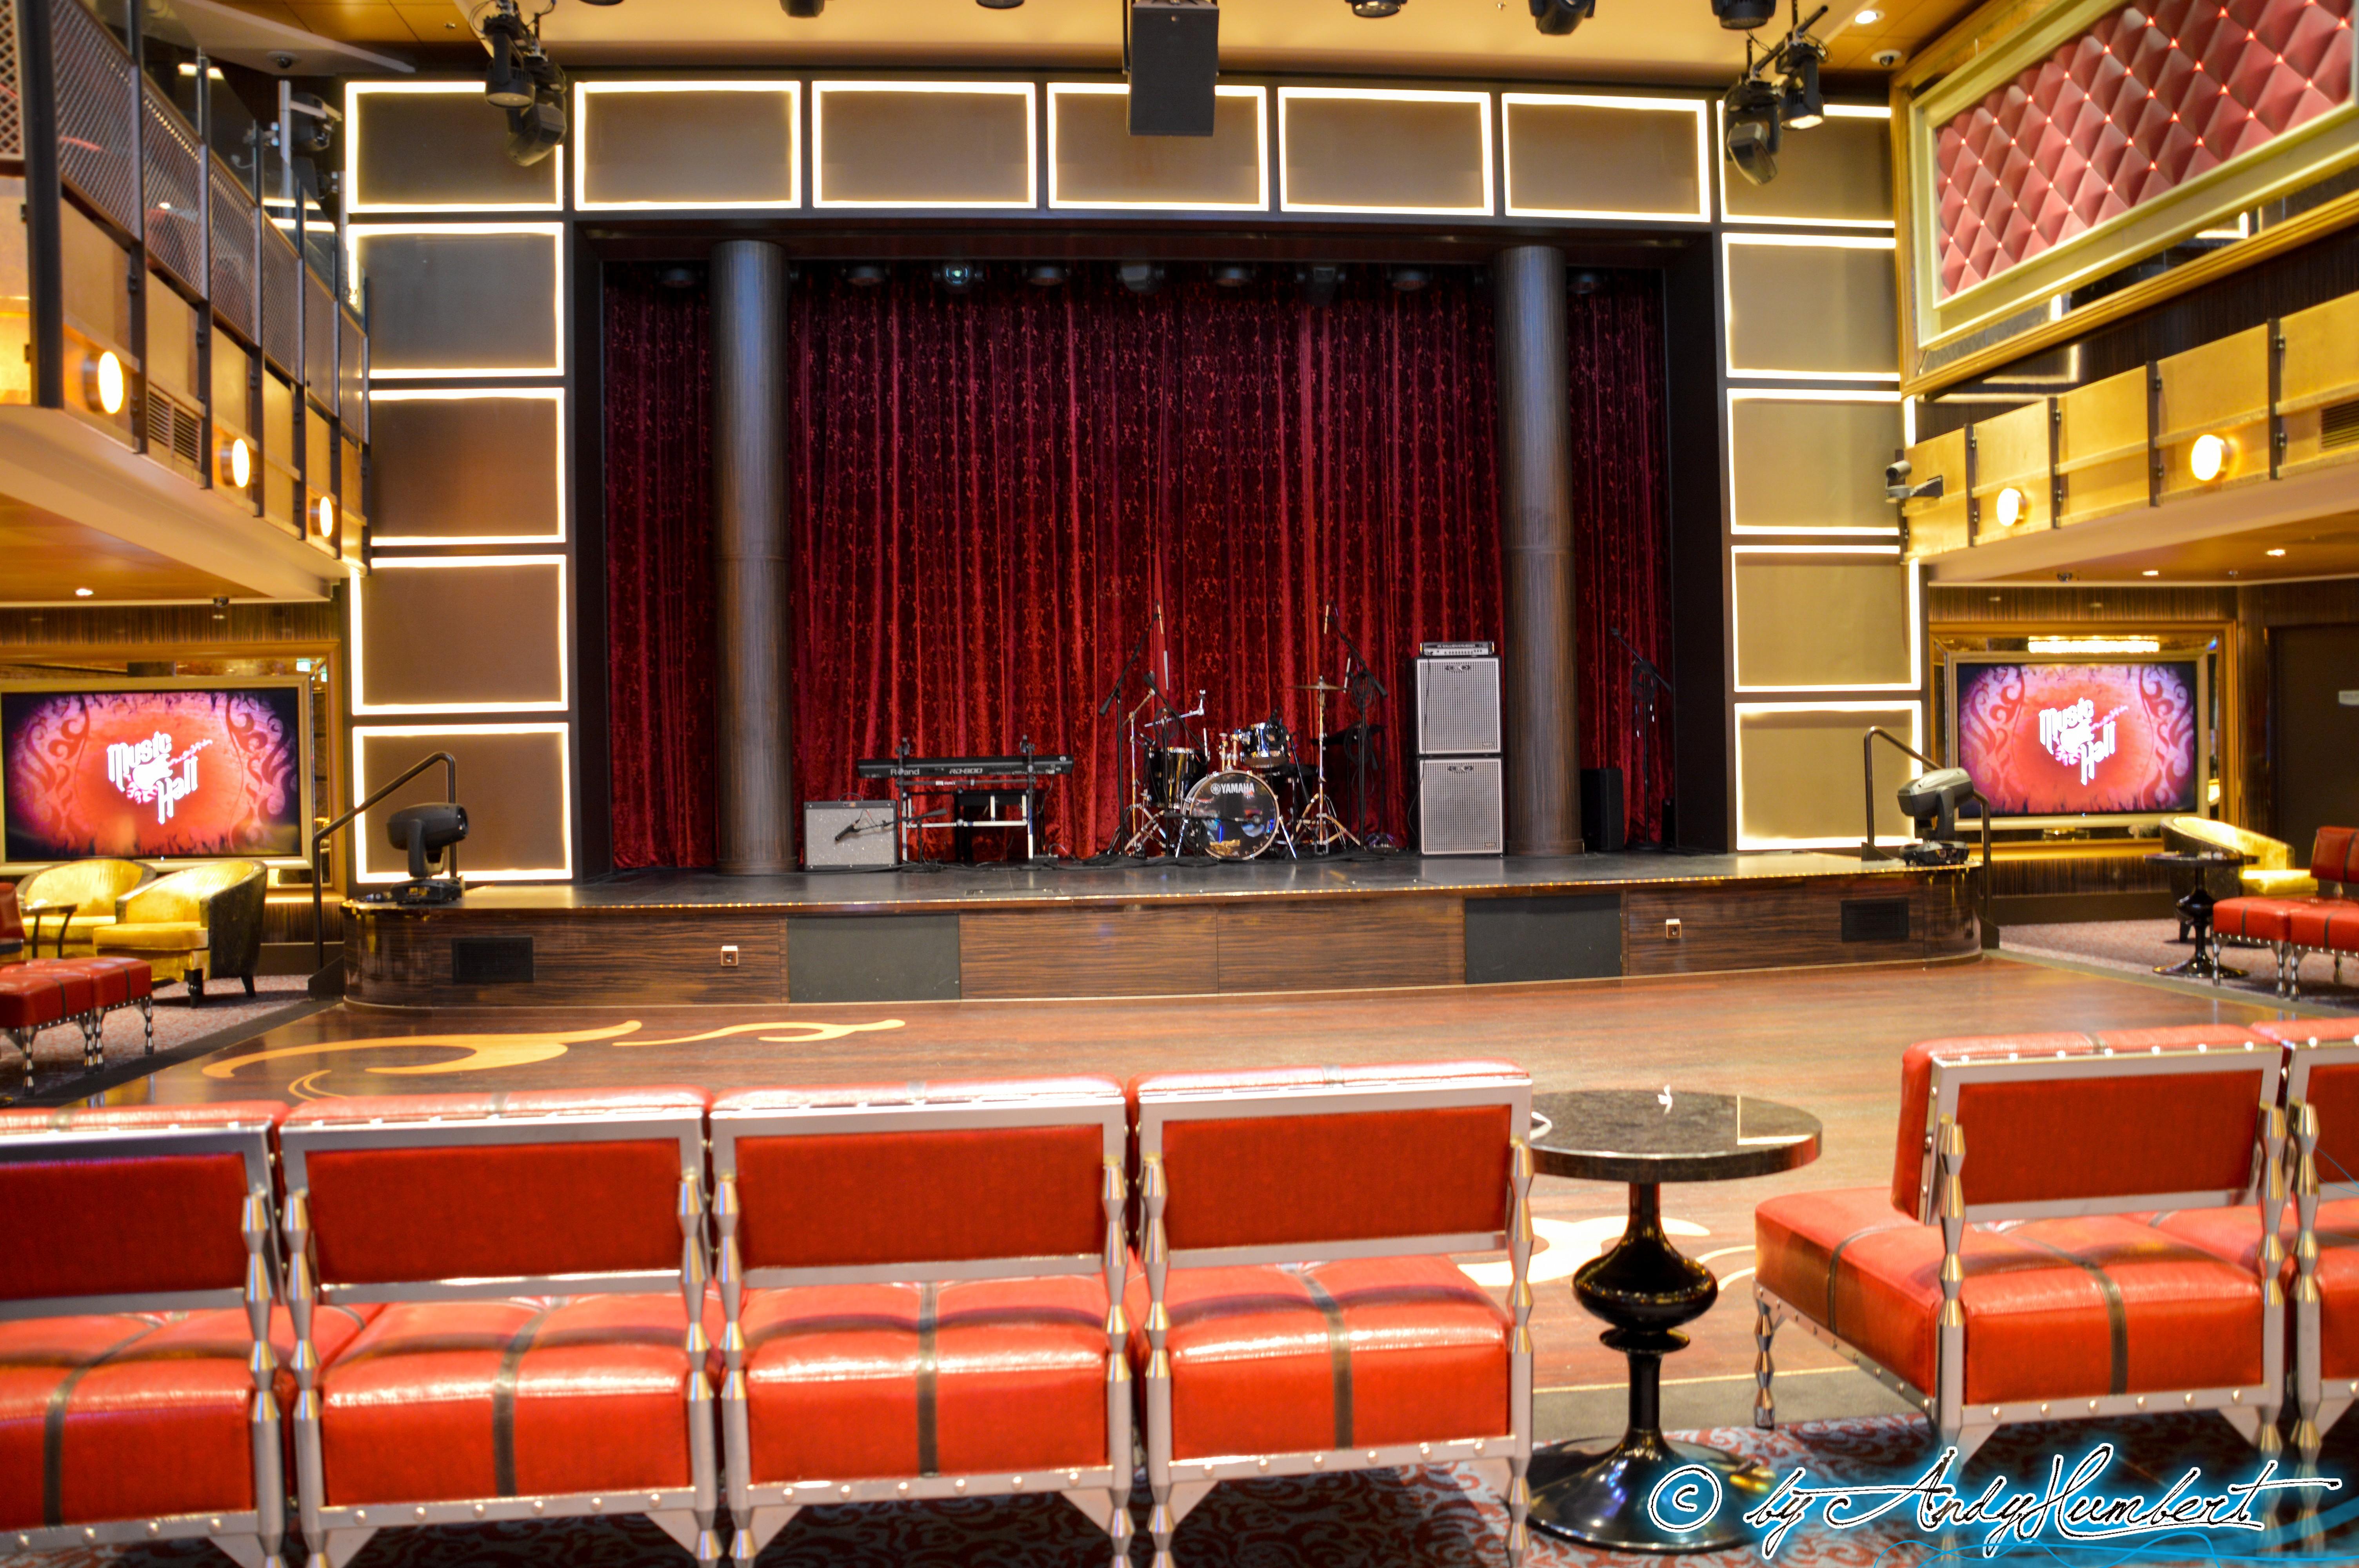 Music Hall (ponts 3 & 4)